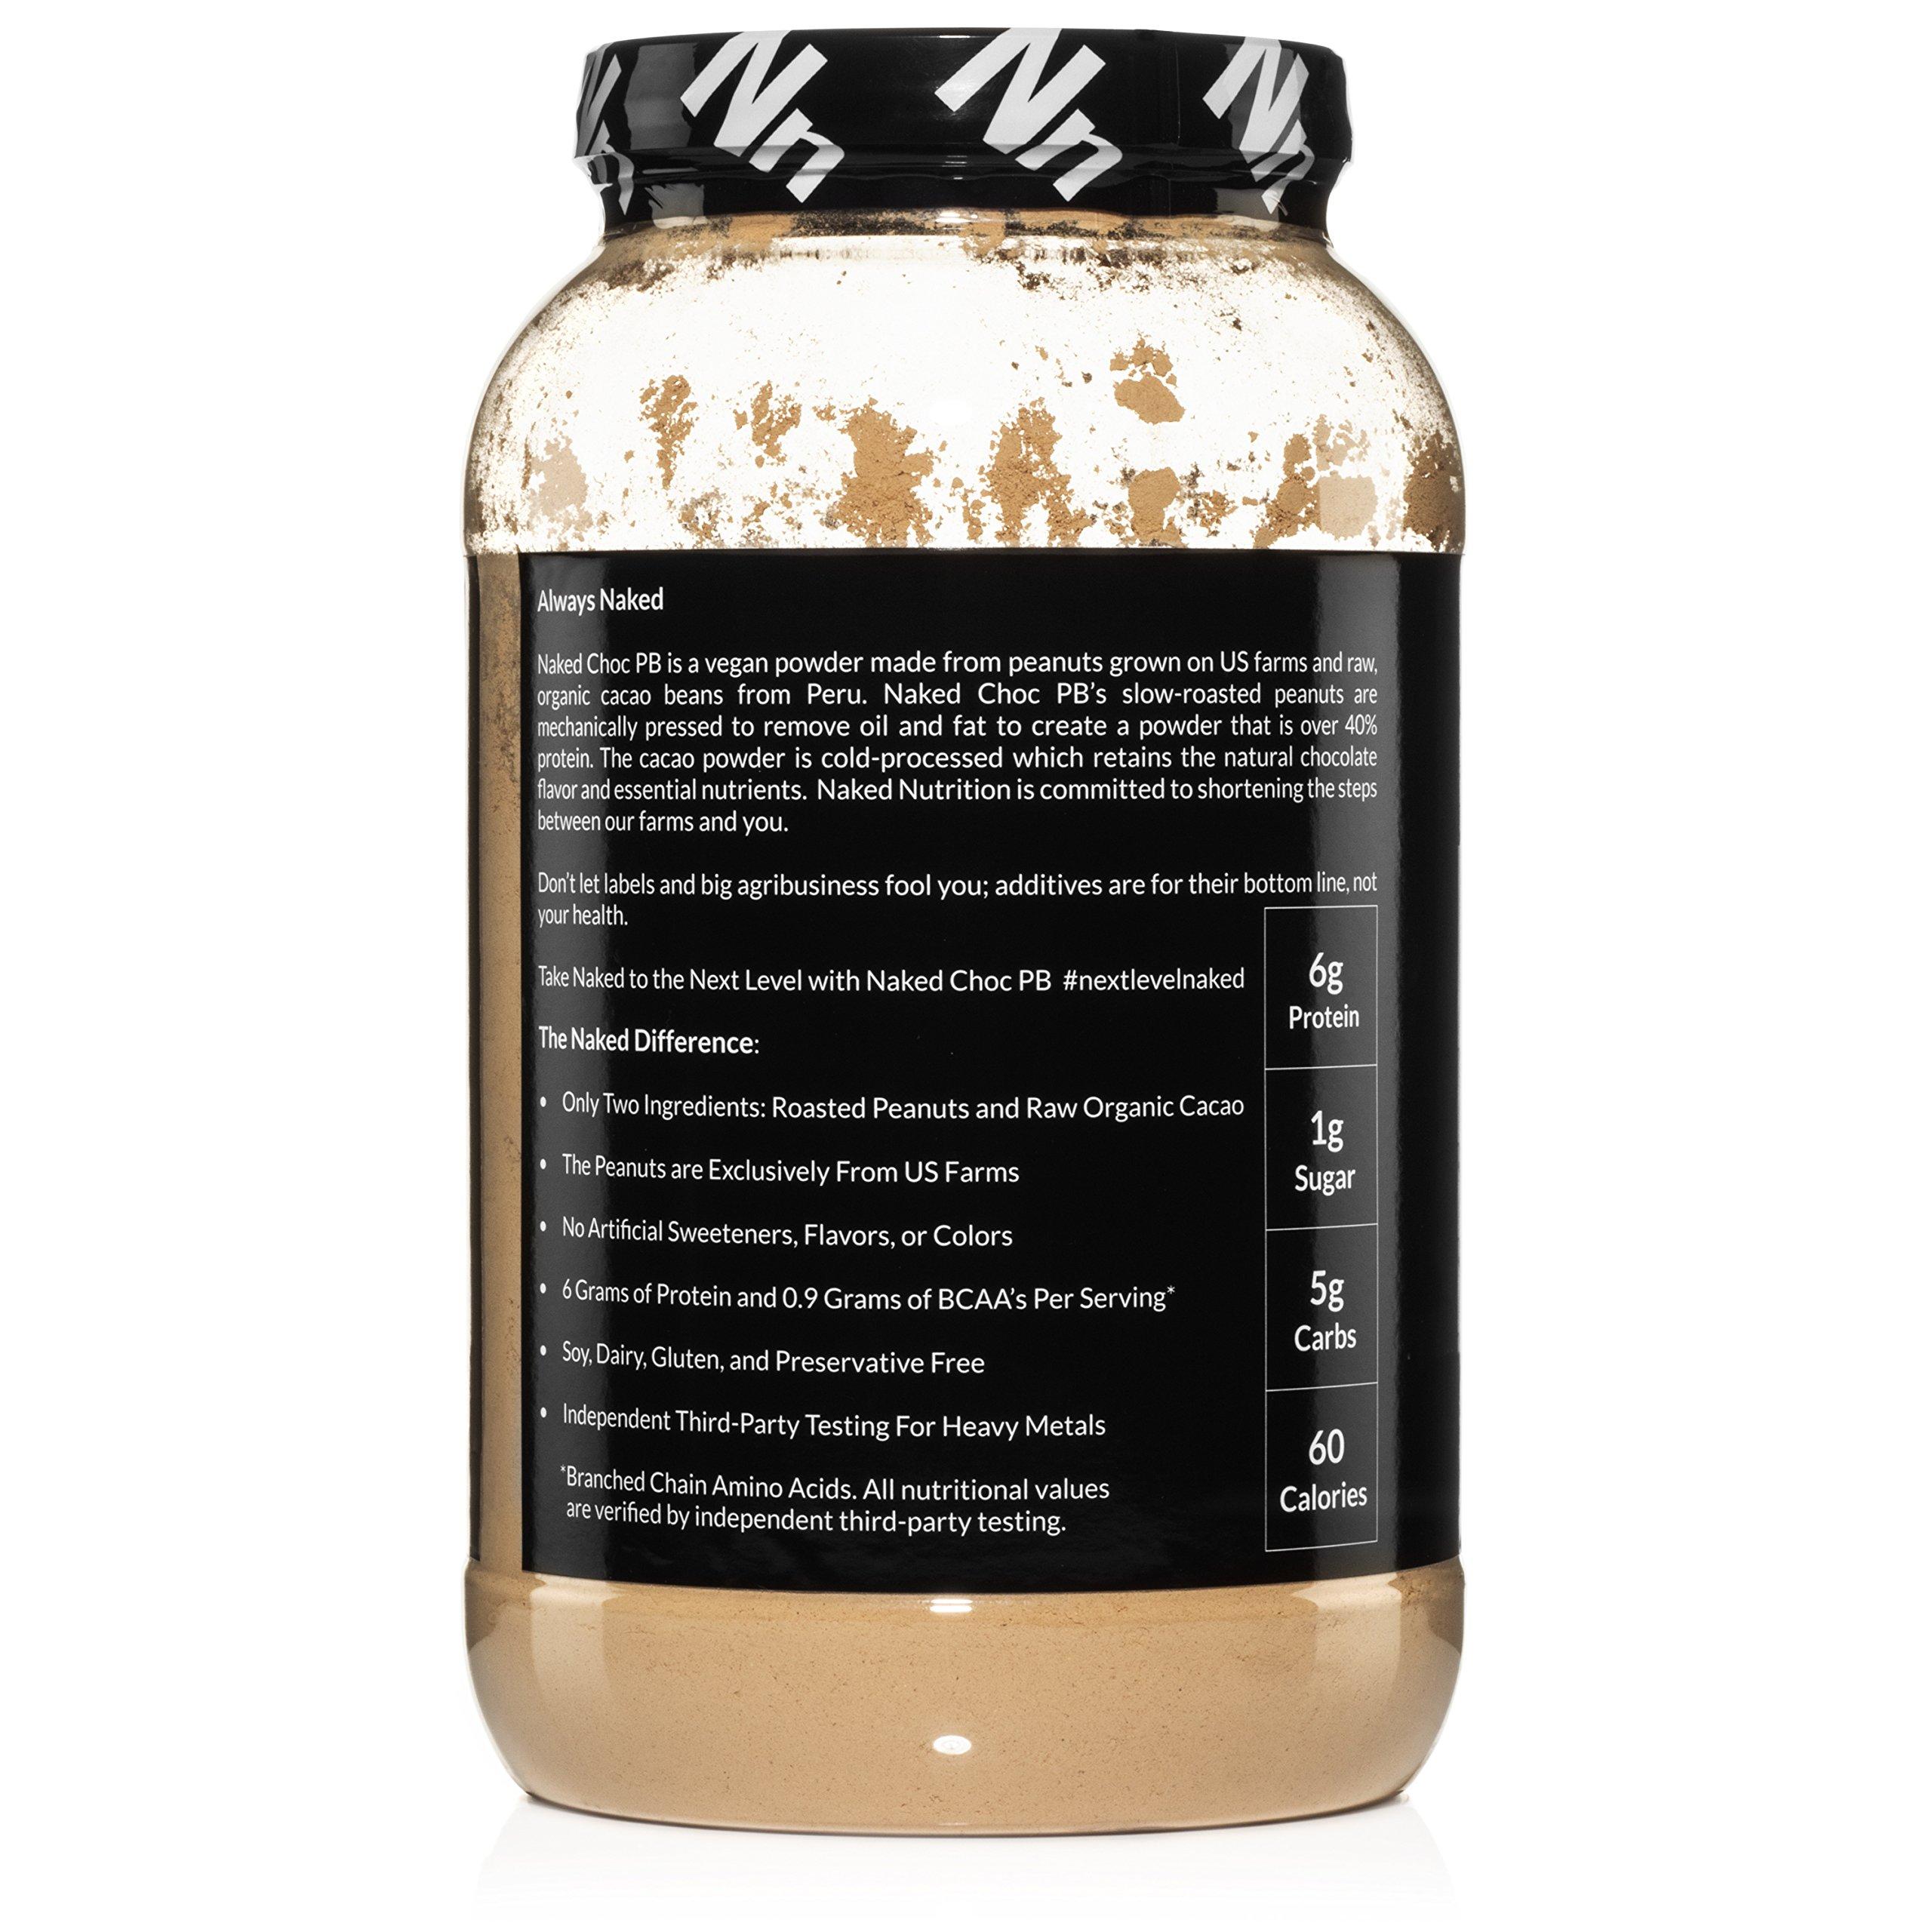 NAKED CHOC PB - Premium Organic Cacao and Powdered PB - 2lb Bulk by NAKED nutrition (Image #3)